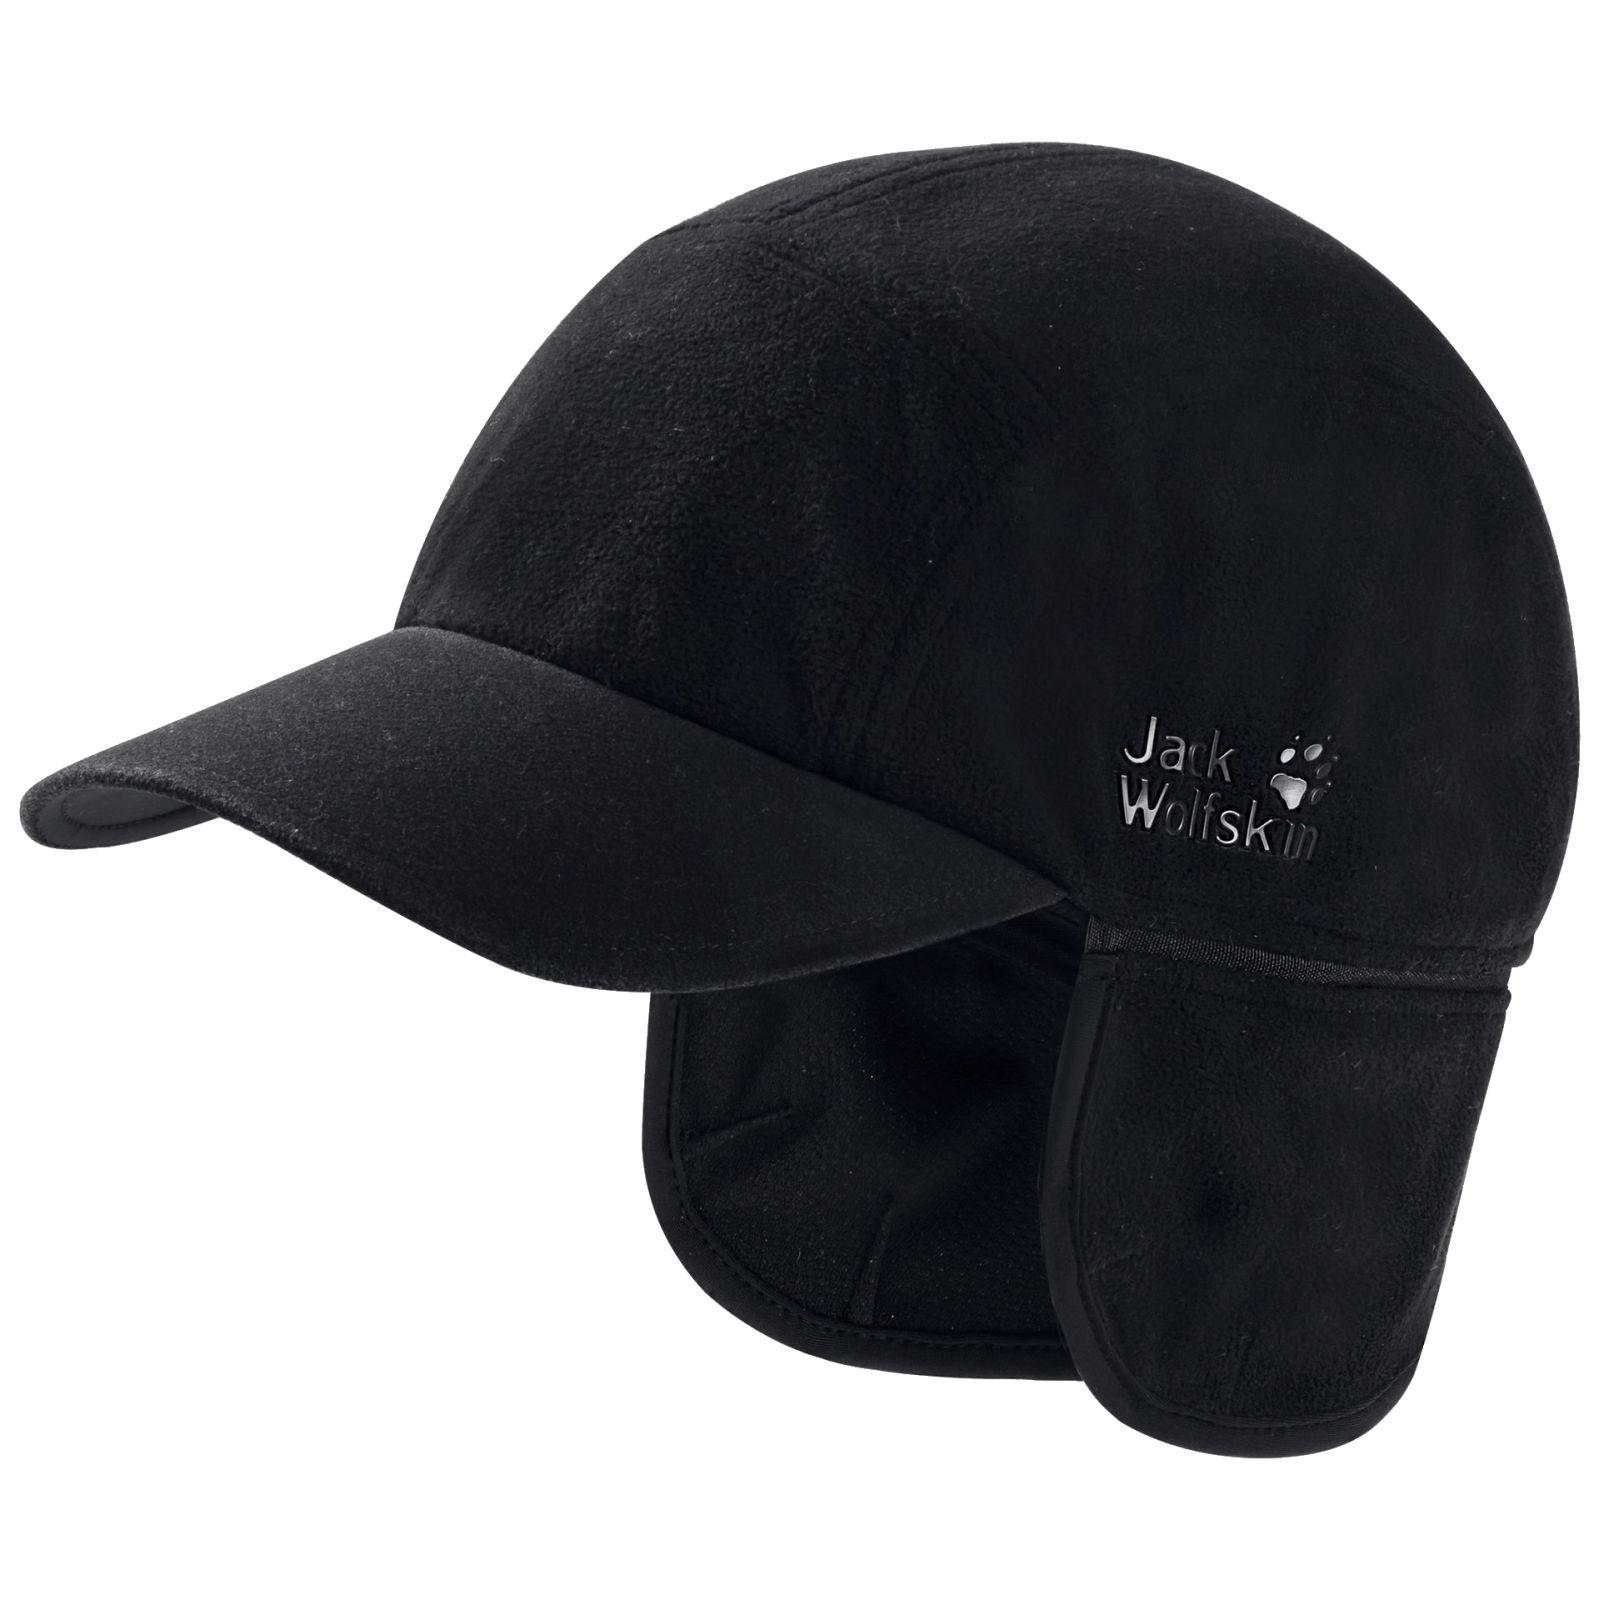 Baseball Blizzard Black Cap About With Flaps Details Jack Wolfskin Men's Stormlock Ear CxBoeWQrd